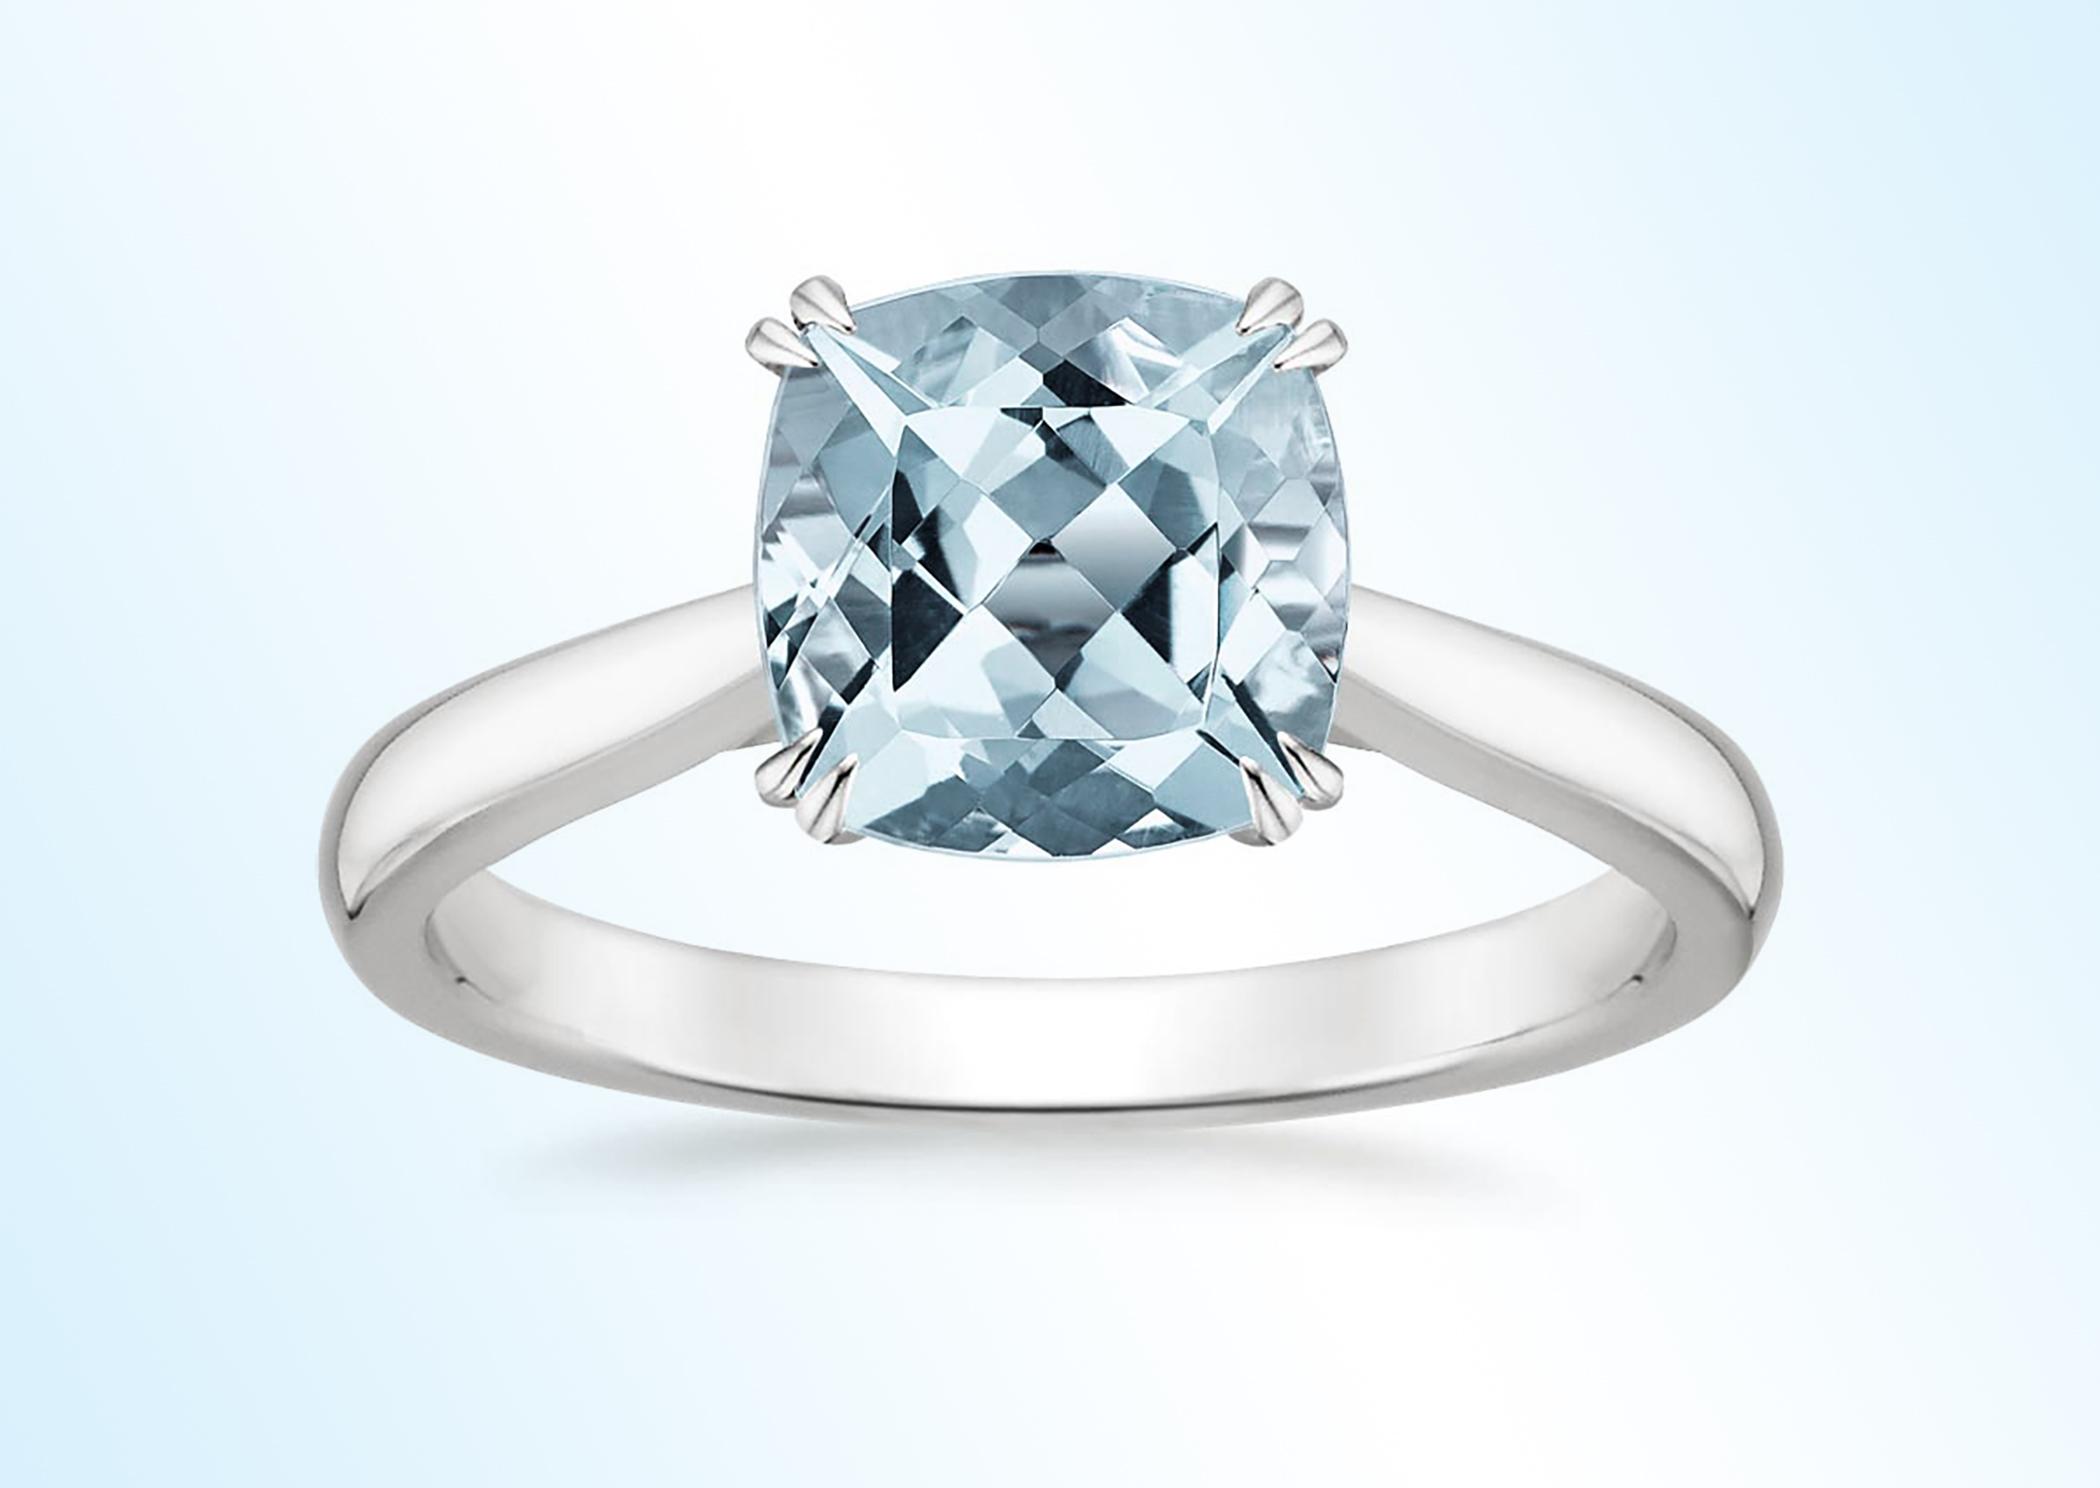 Aquamarine Audrey Ring from Brilliant Earth